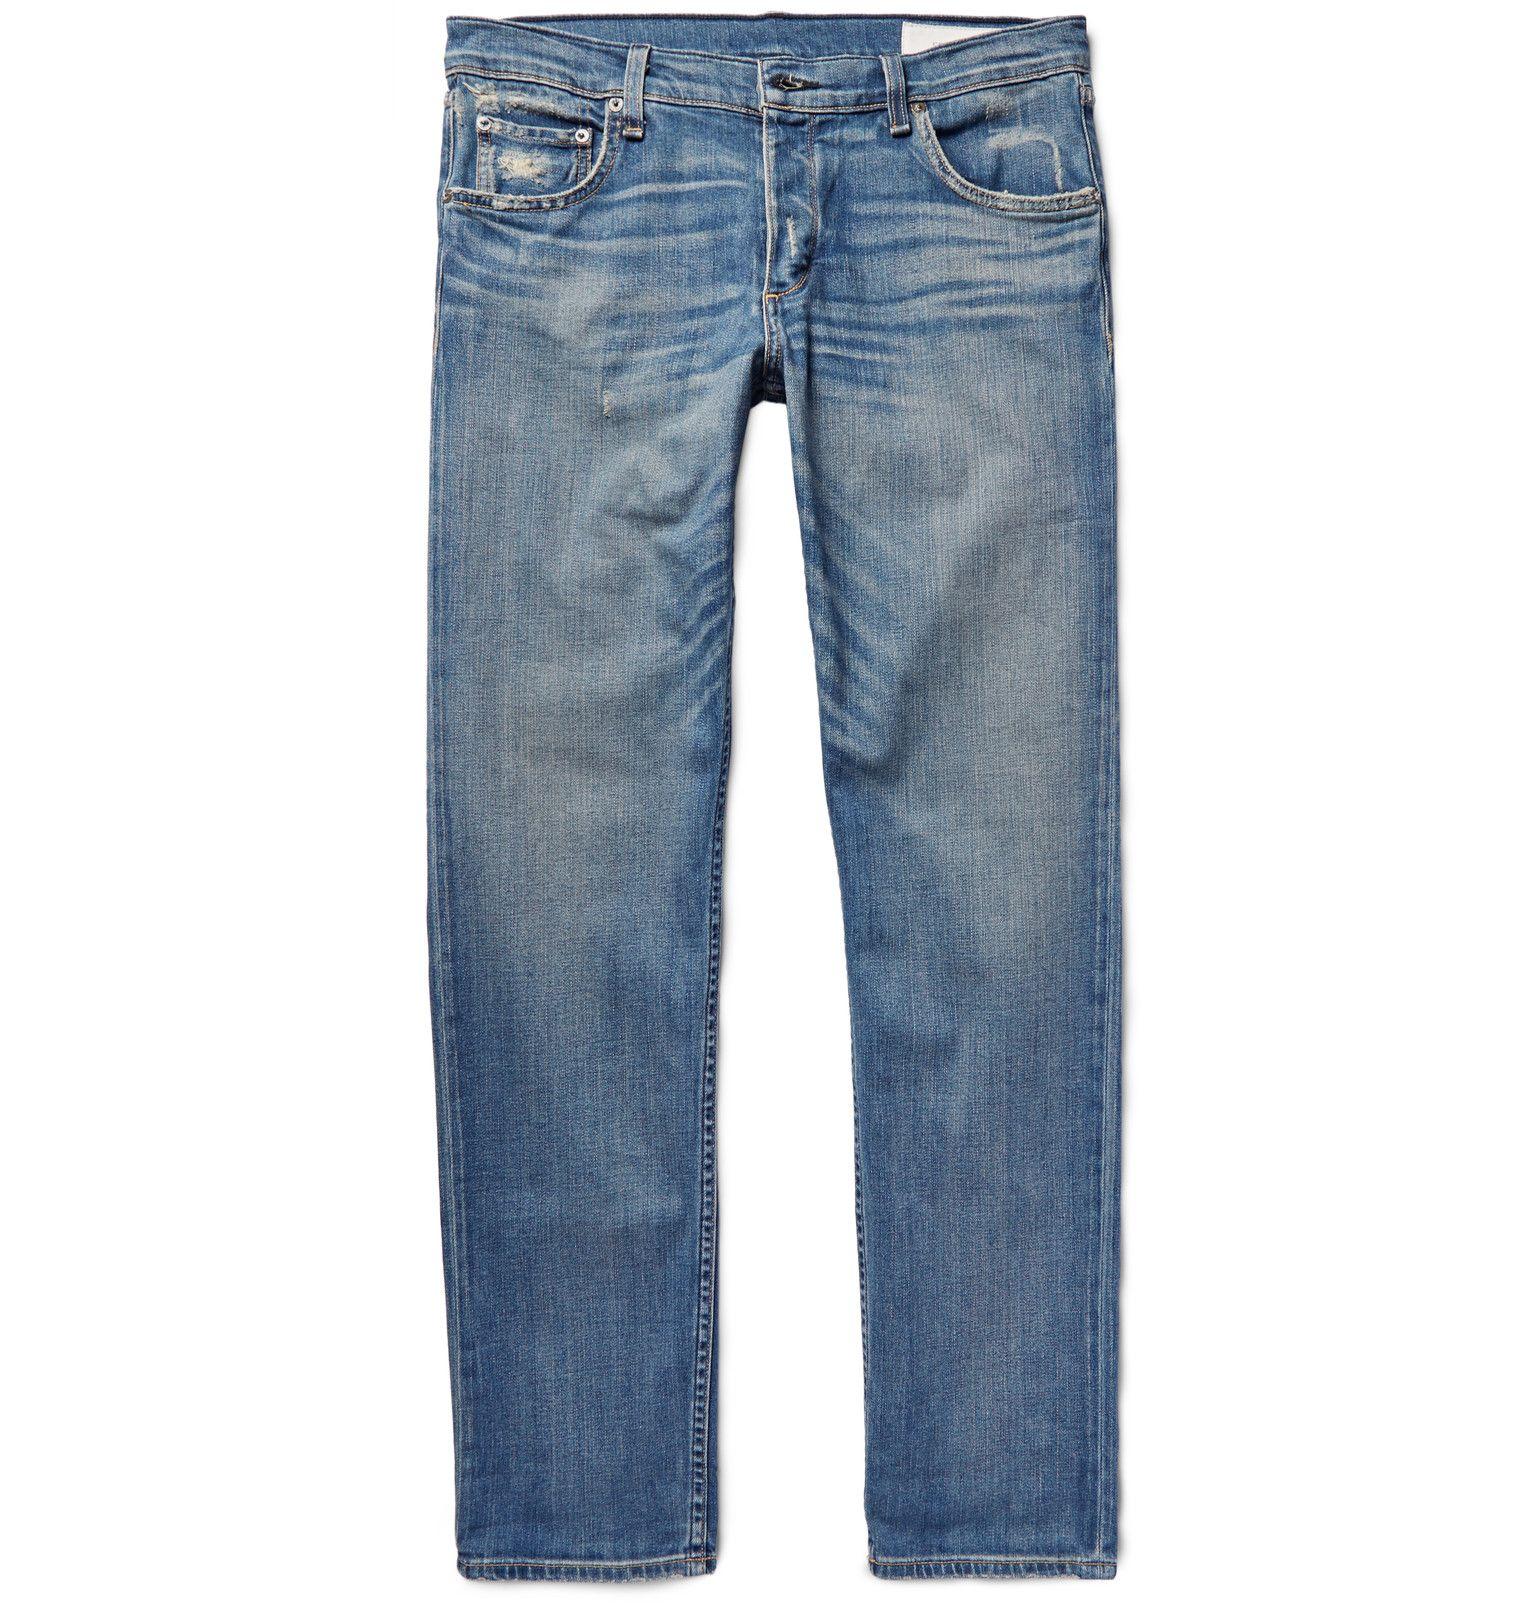 2 S'adapter Jeans Slim Rag & Bone lm8saUSyt